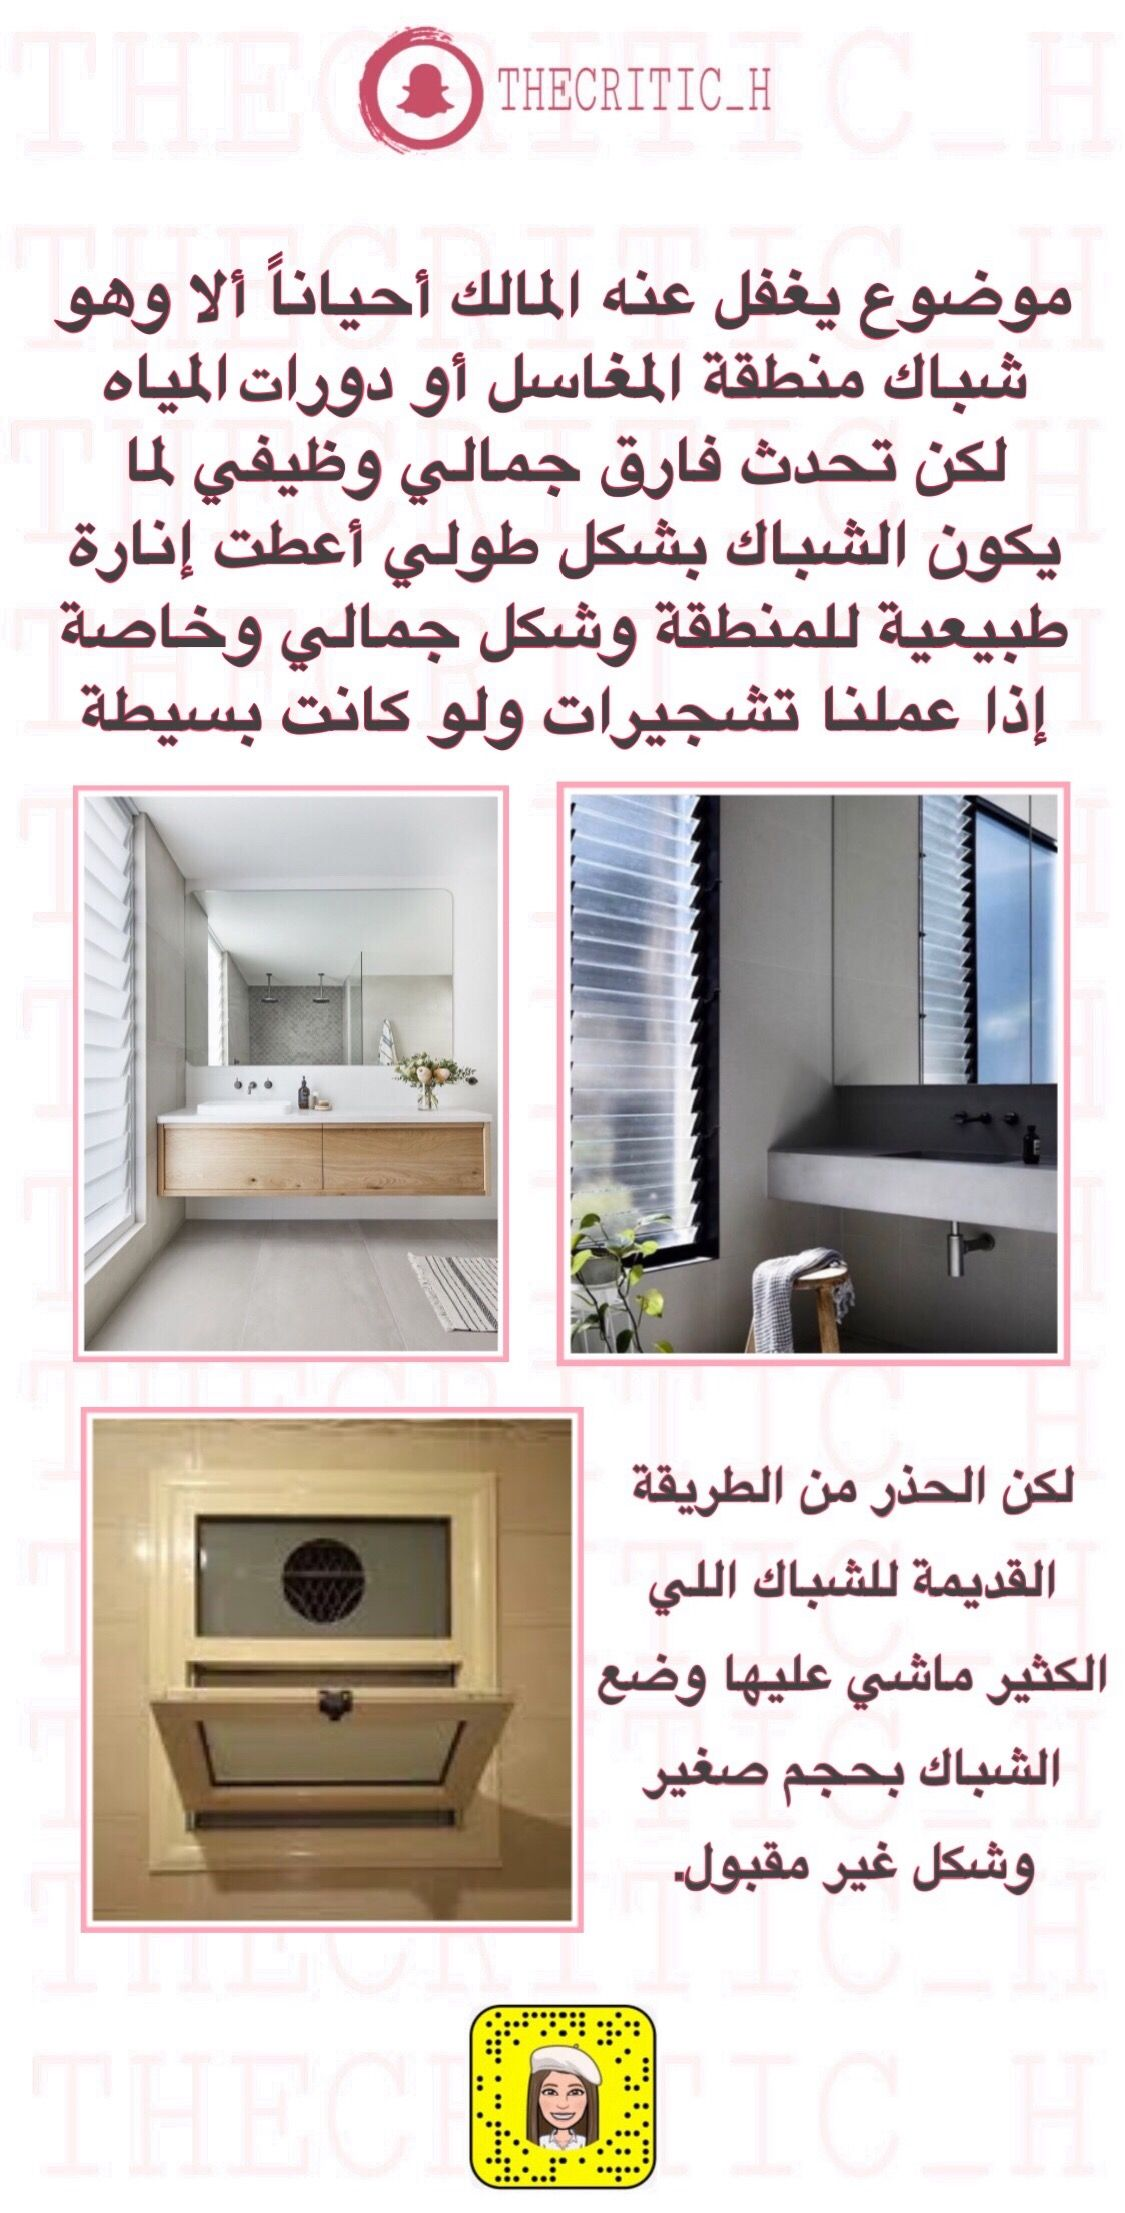 نوافذ دورات المياه In 2021 Bathroom Remodel Designs Home Decor Furniture Closet Decor